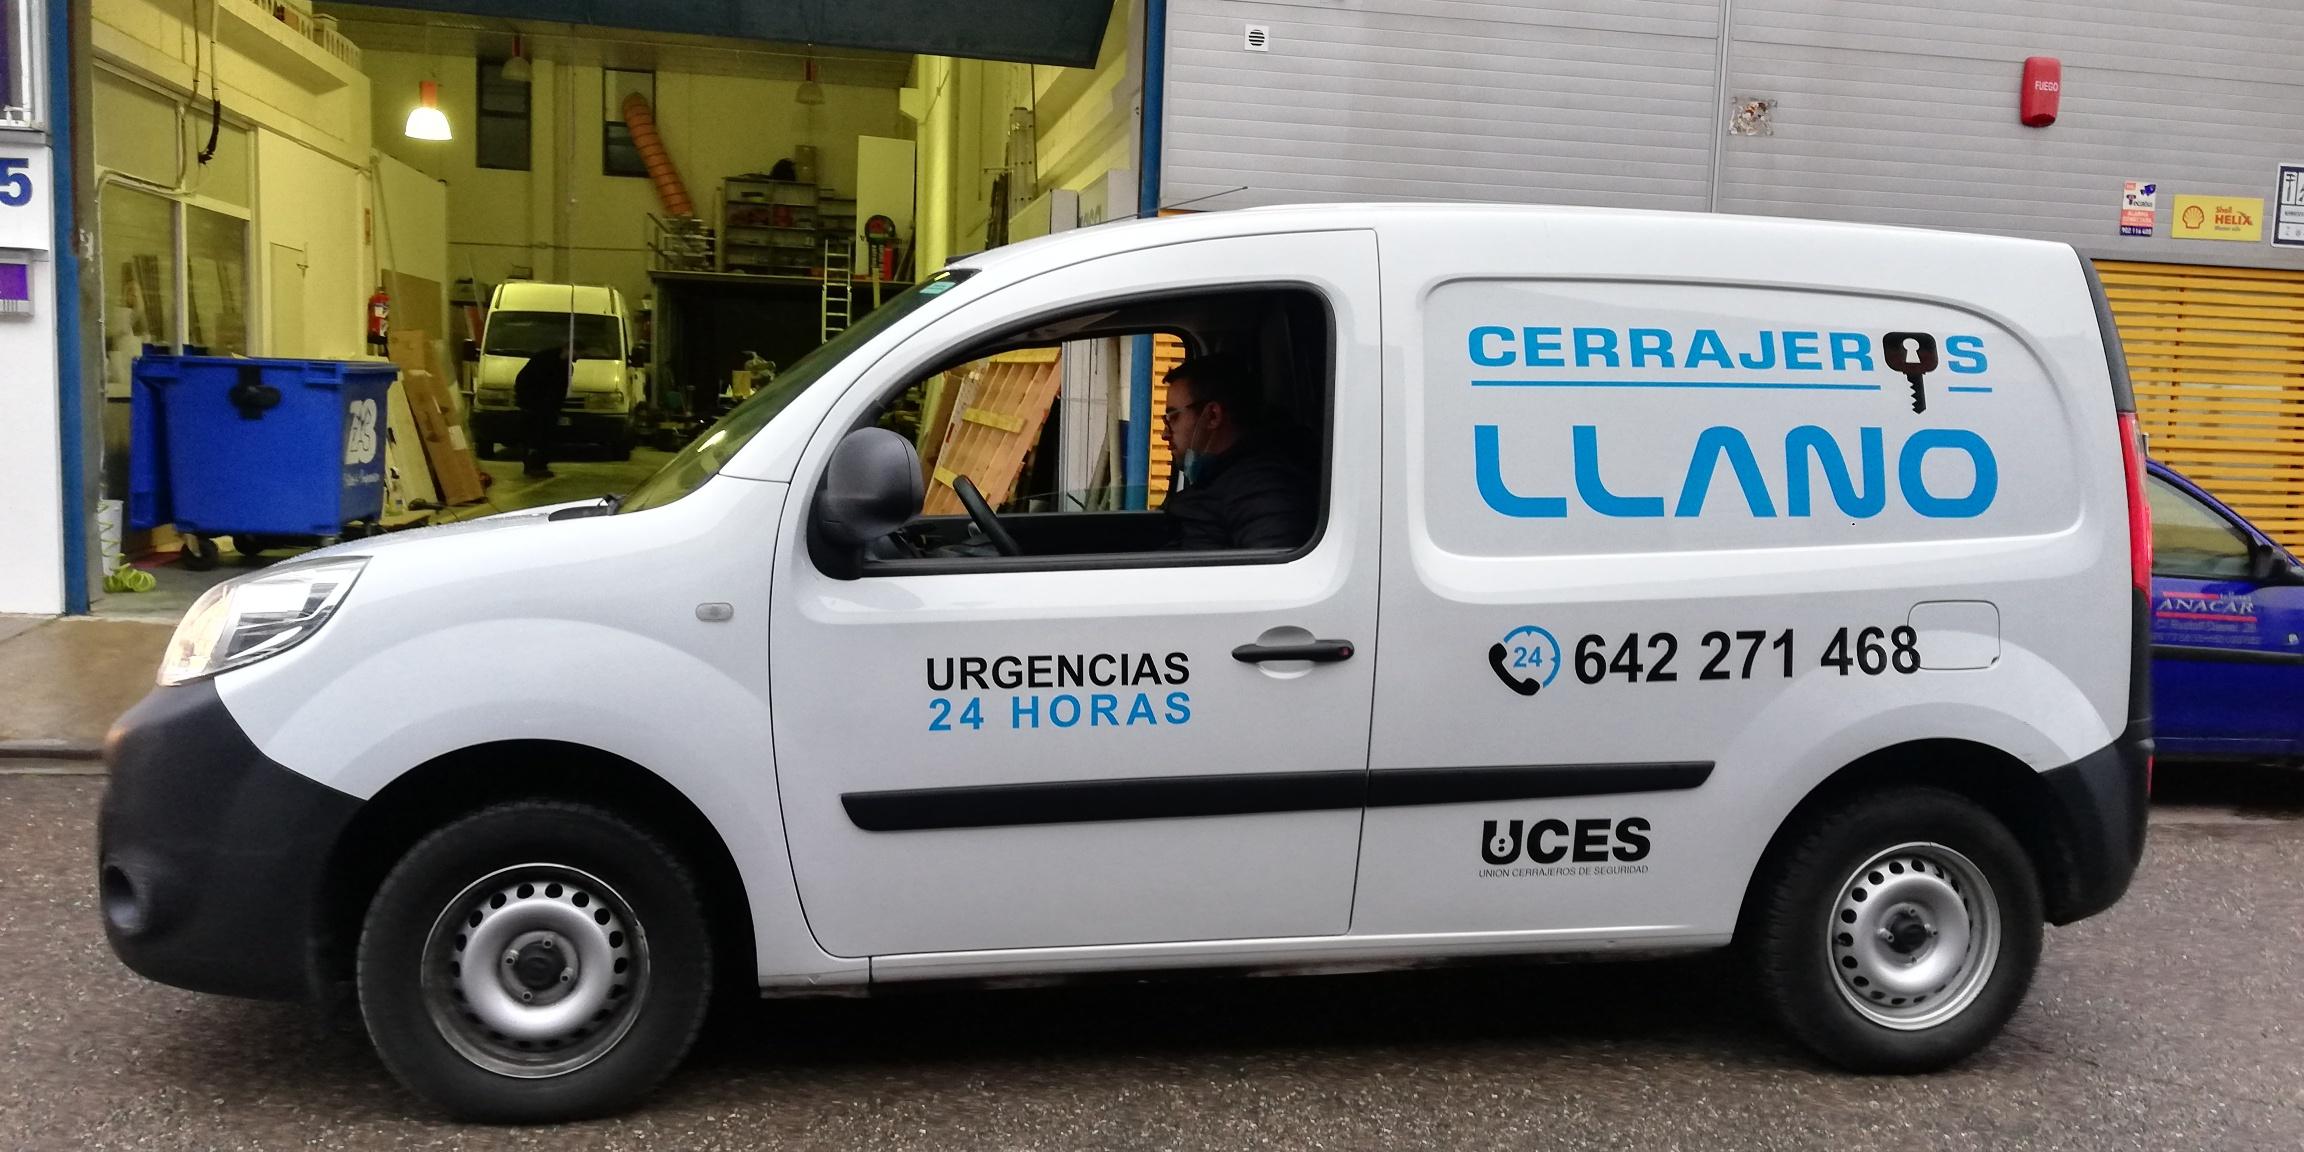 Rotulacion_furgoneta_cerrajeros_LLano